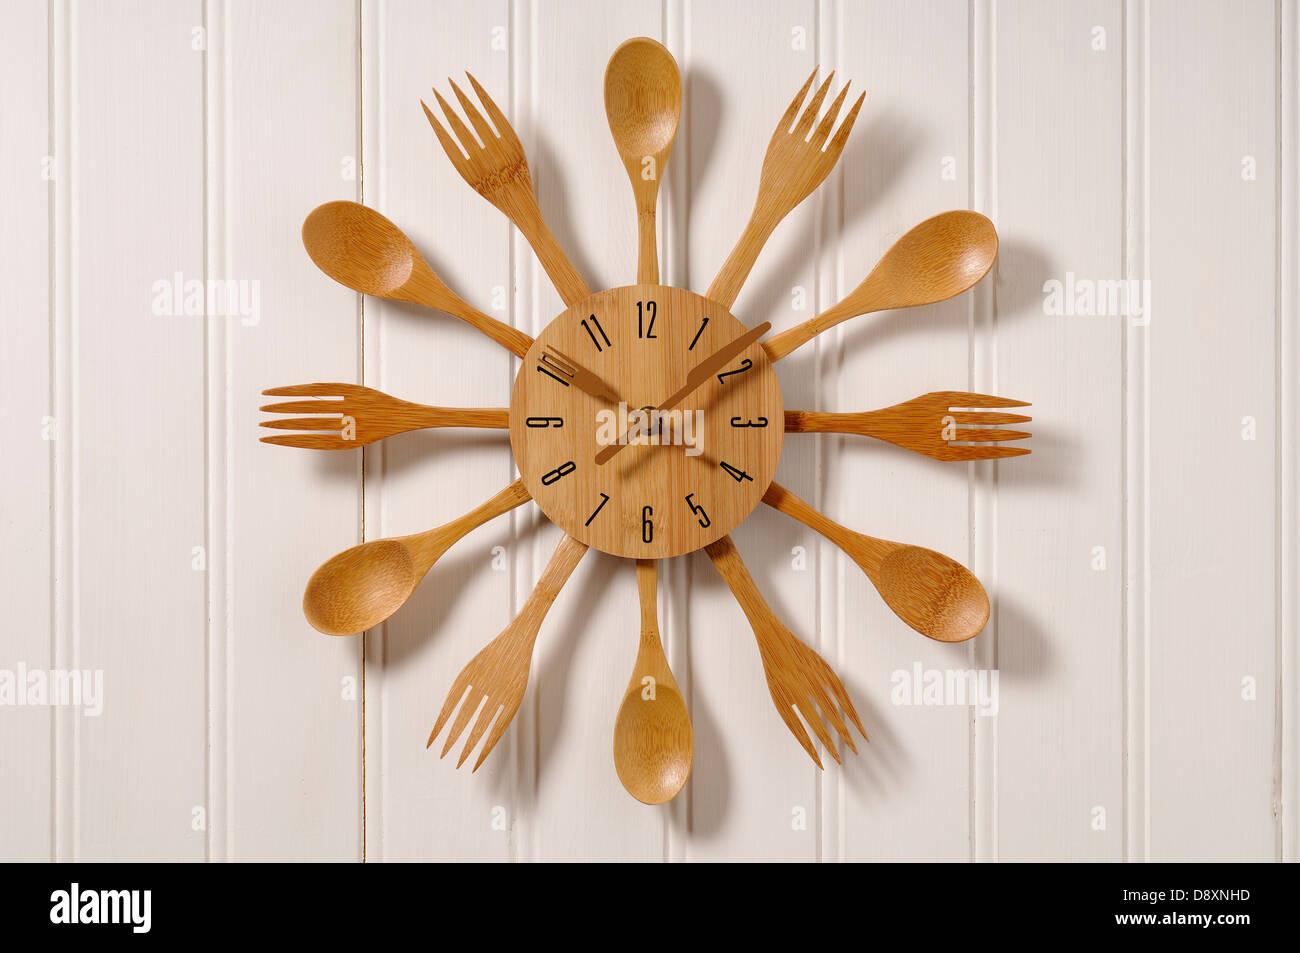 Clock Made Wooden Cutlery Stock Photos & Clock Made Wooden